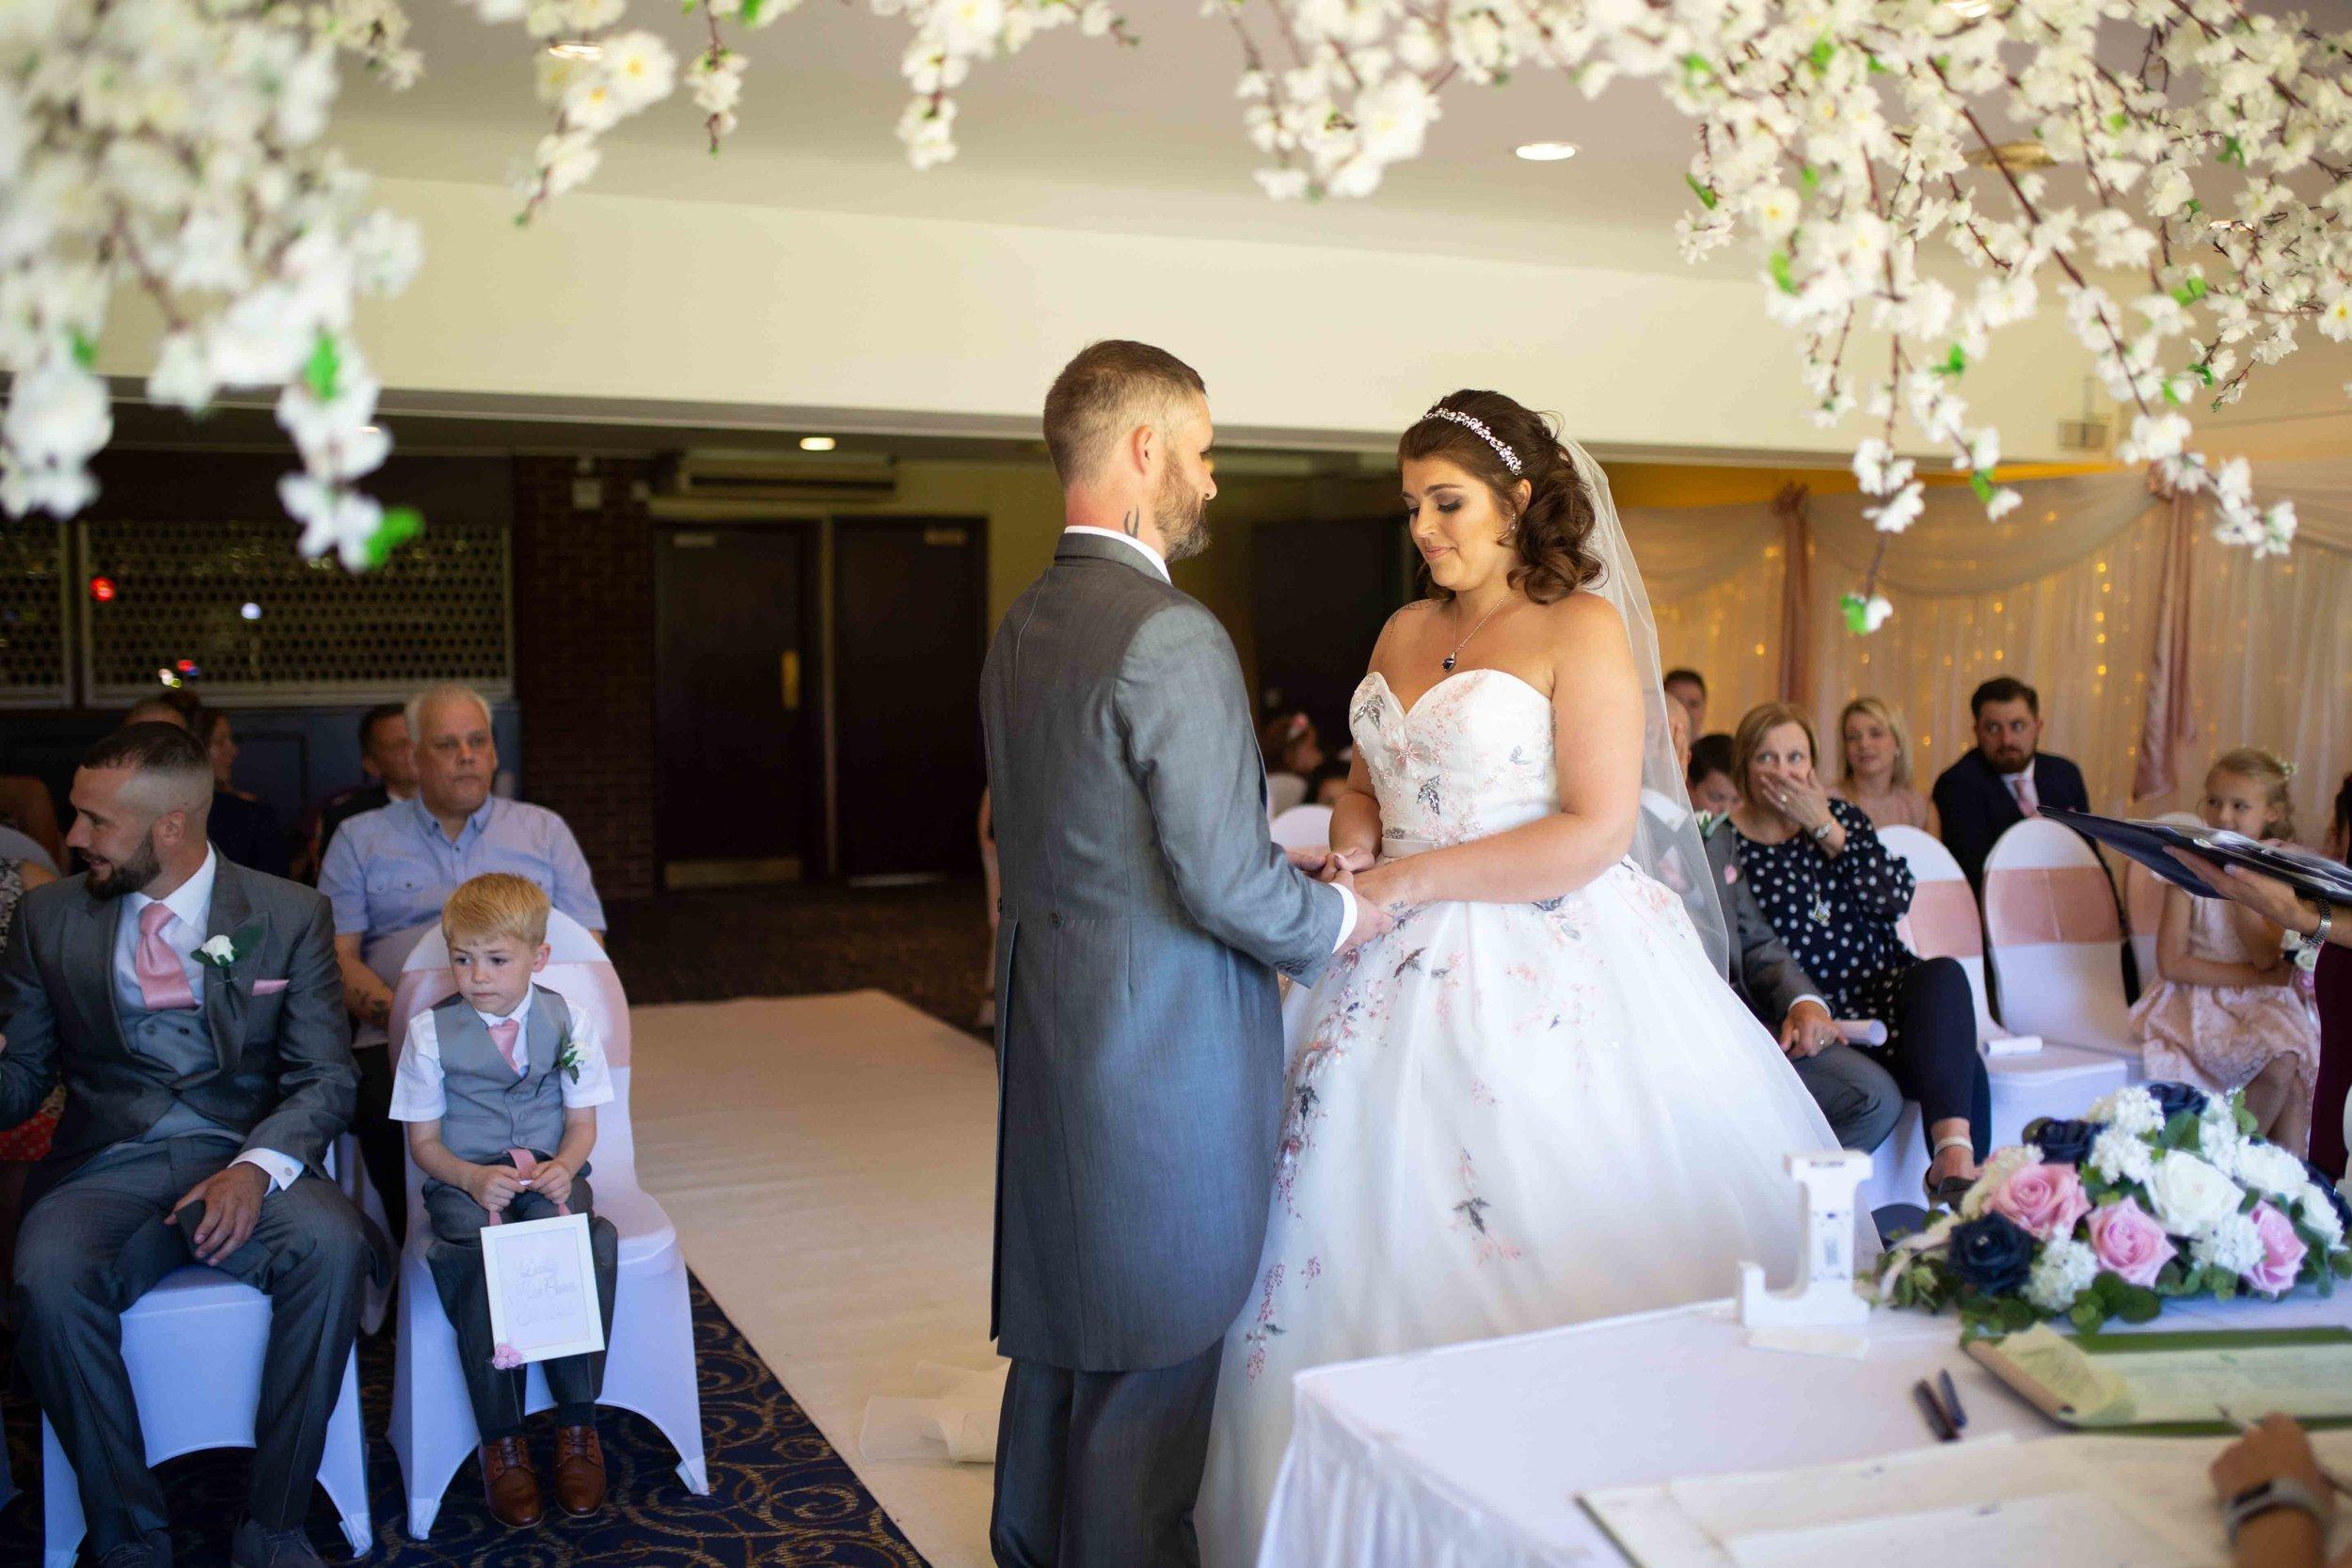 Lea-cooper-photography-wedding-photography-wolverhampton-patshull-park-hotel-wedding-pattingham-wolverhampton-west-midlands-uk-22.JPG